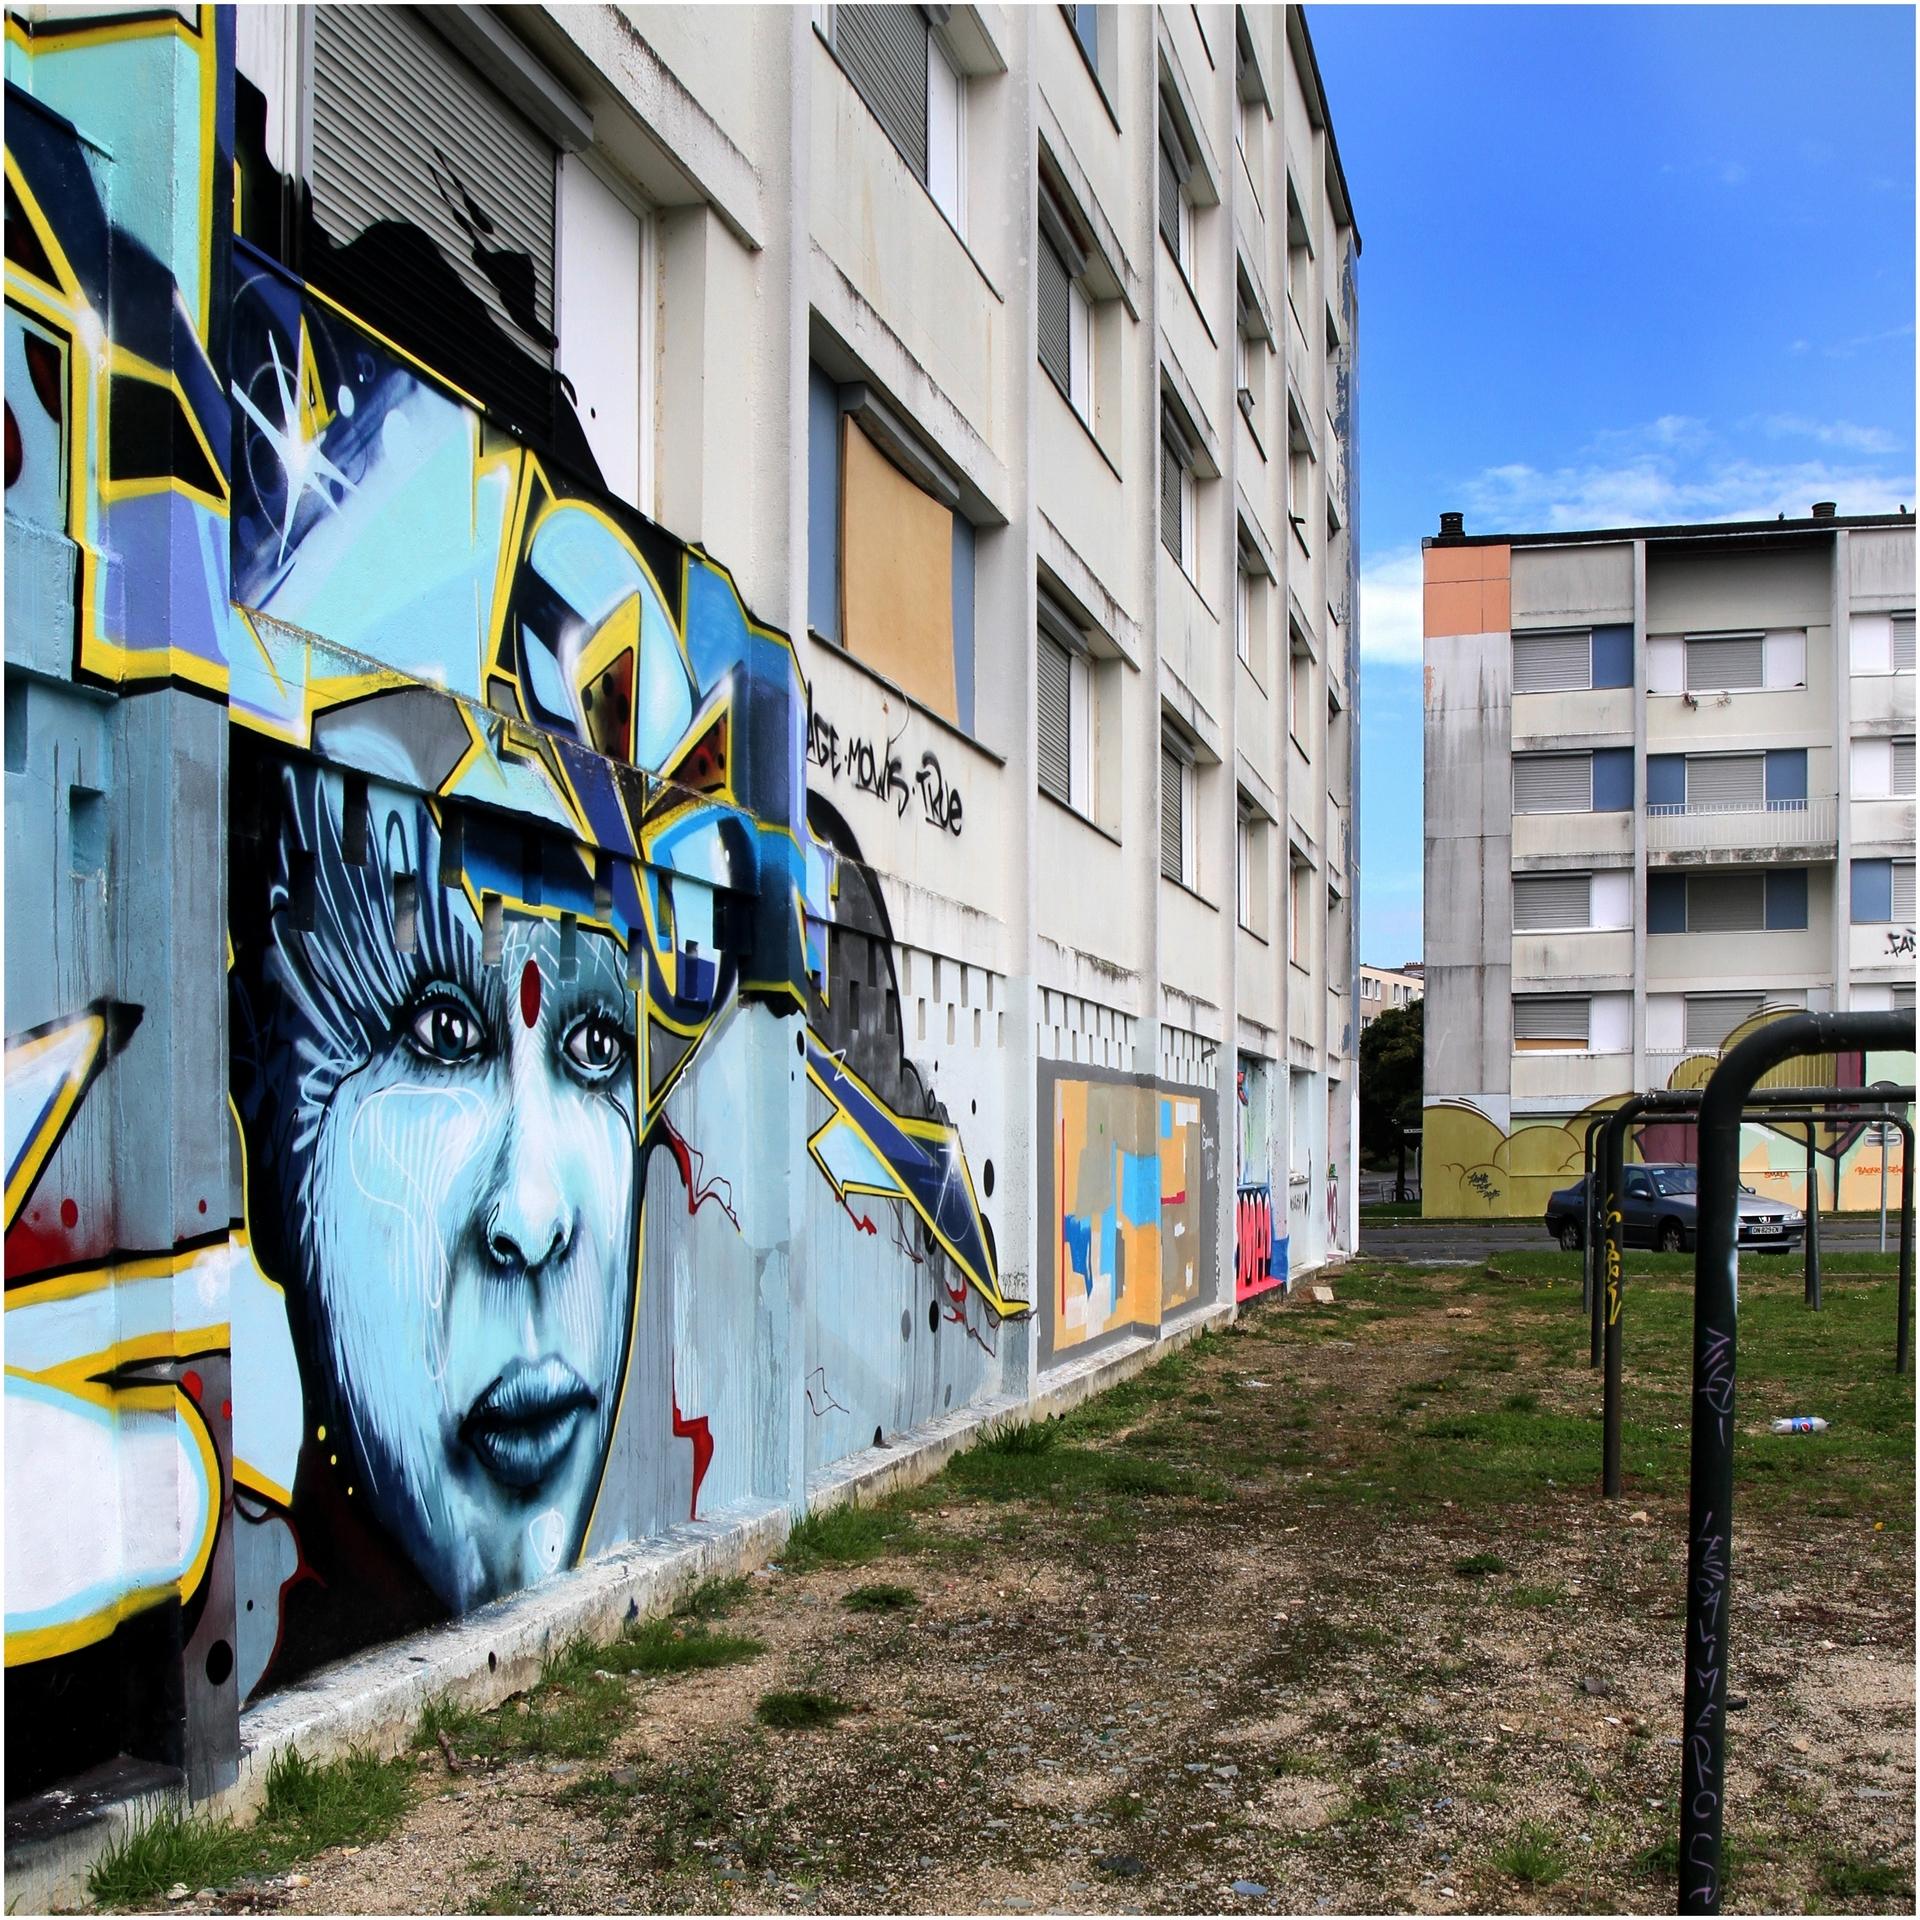 097 Reimeringer Thierry - Ex-City